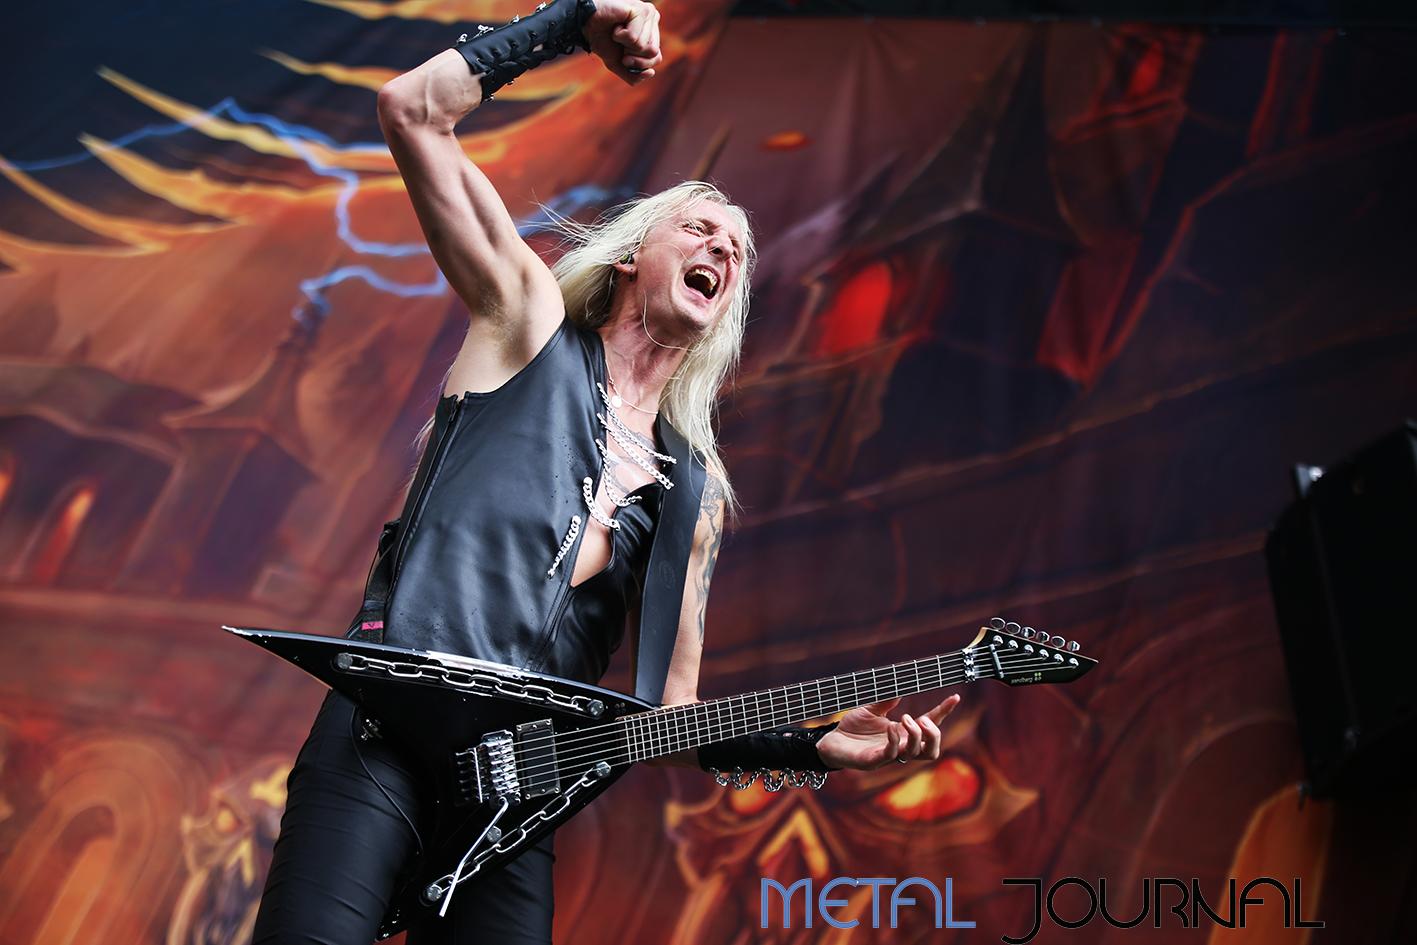 hammerfall - metal journal rock fest barcelona 2019 pic 10